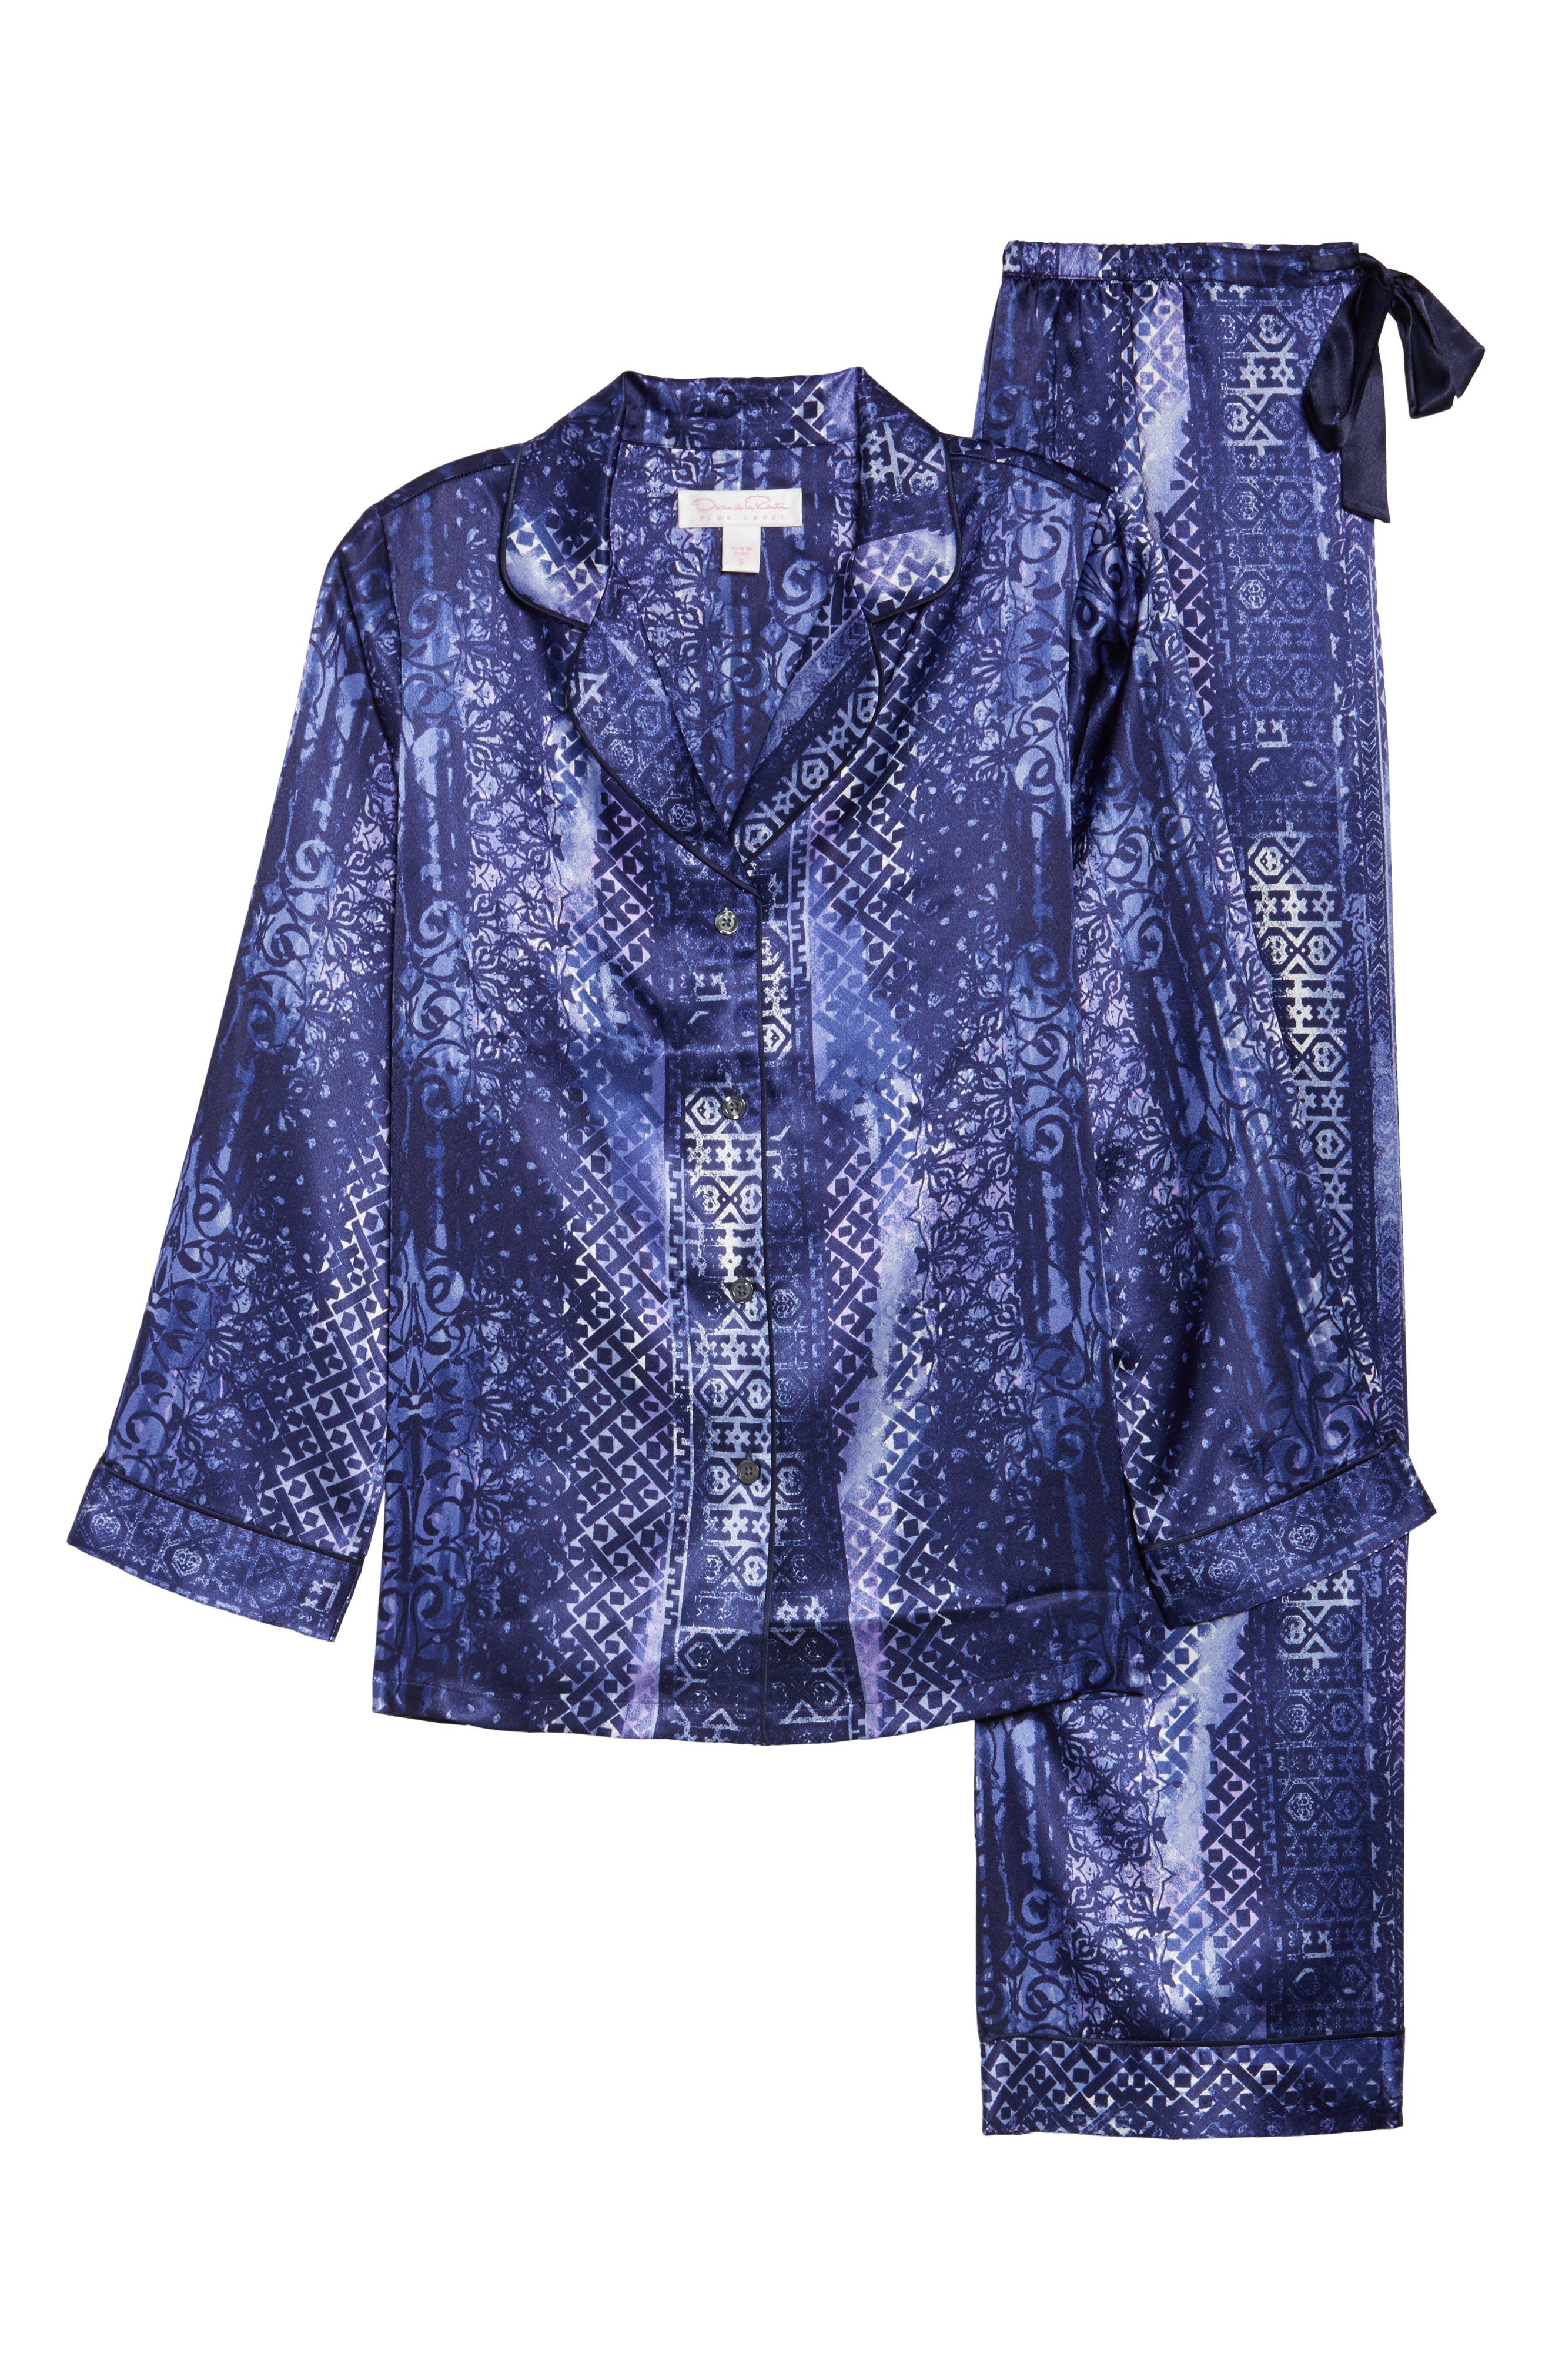 Sleepwear Charmeuse Pajamas,                             Alternate thumbnail 6, color,                             497